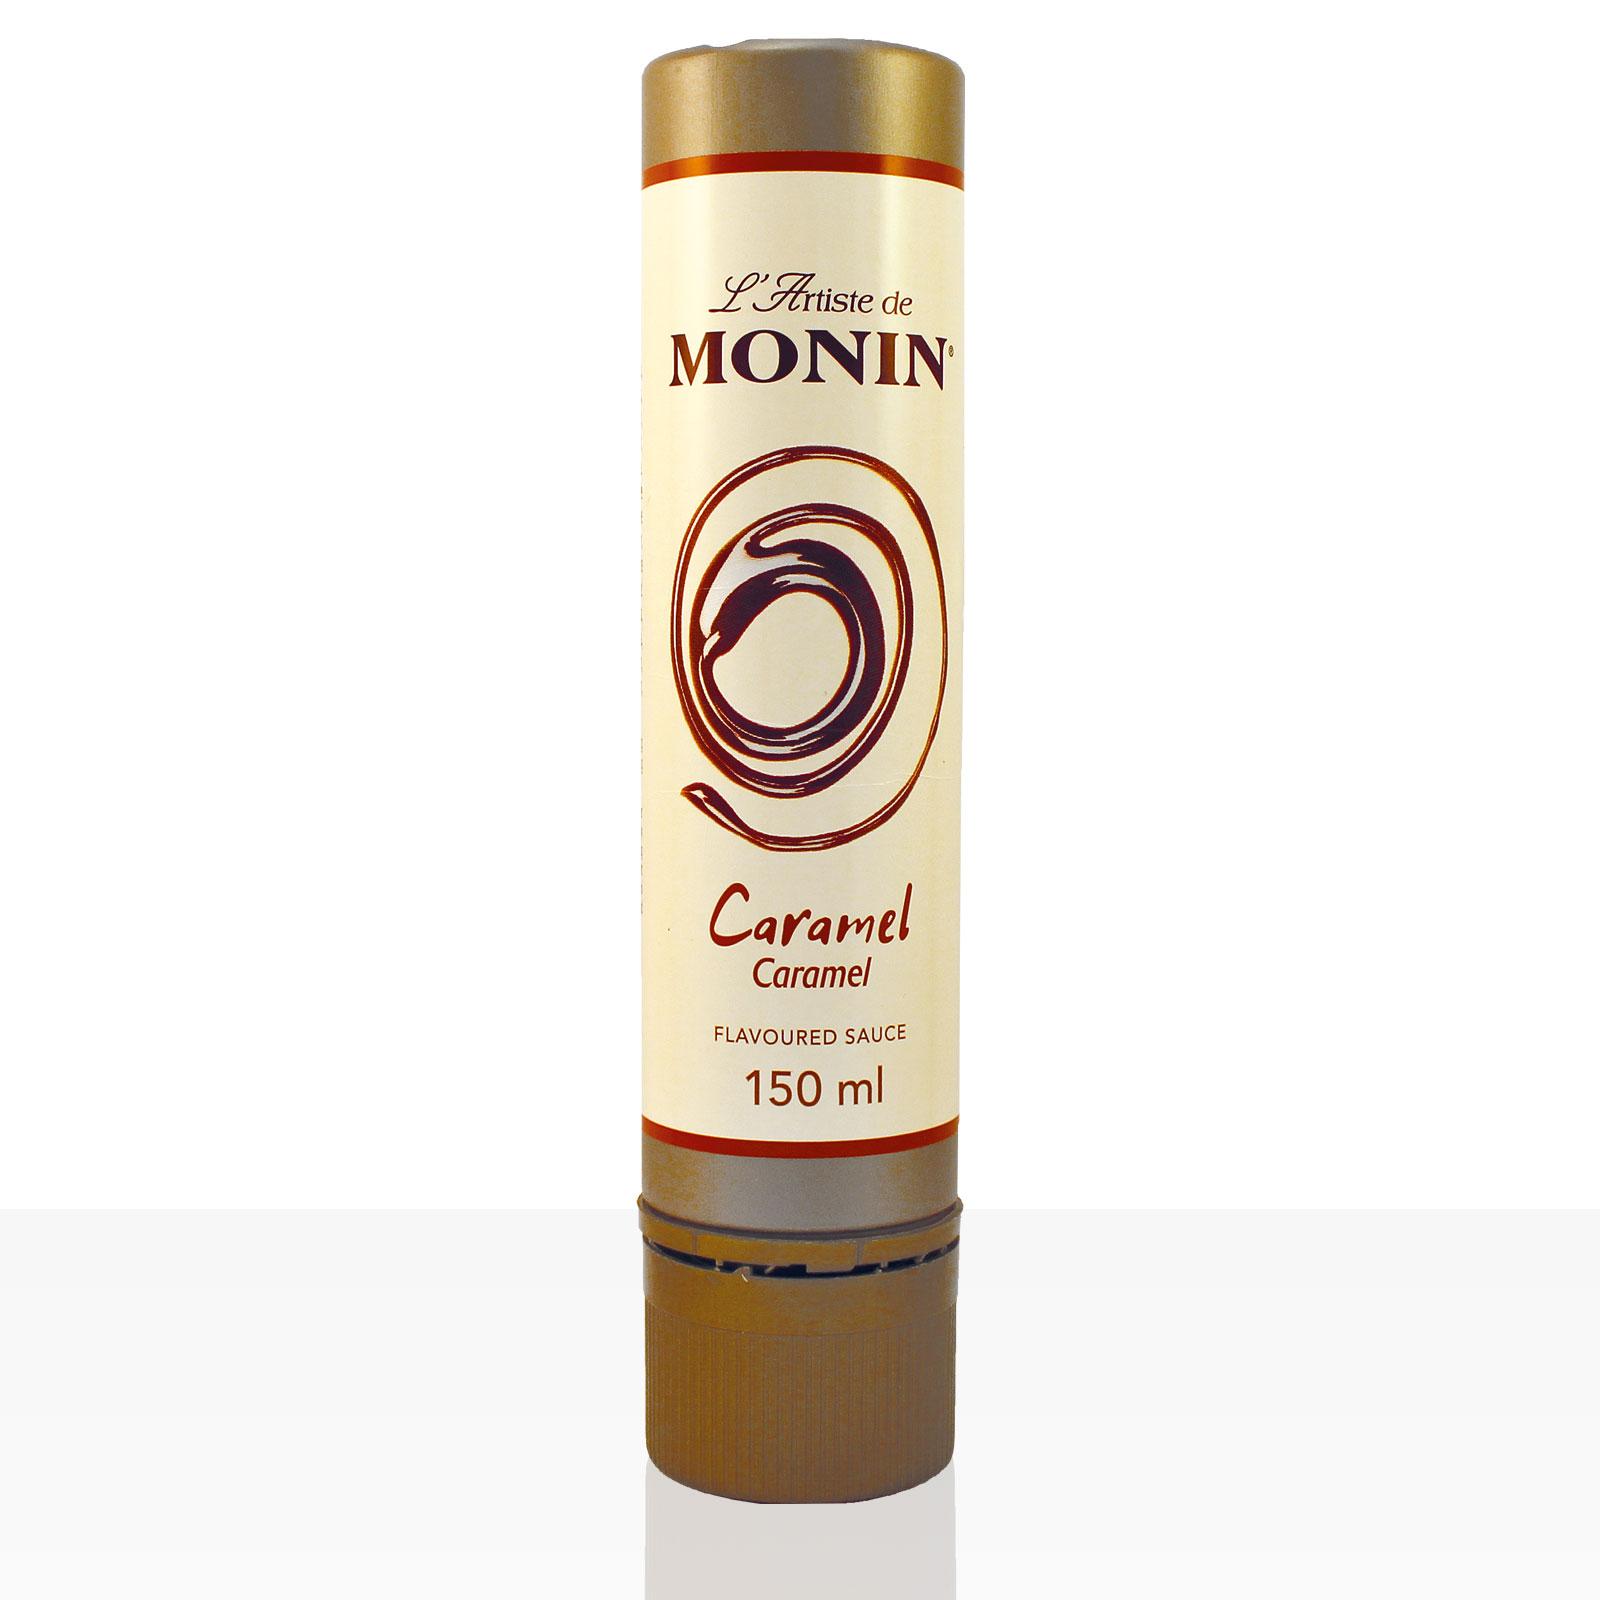 Monin L'Artiste de Monin Caramel Garnier-Sauce 150 ml, Karamell-Soße